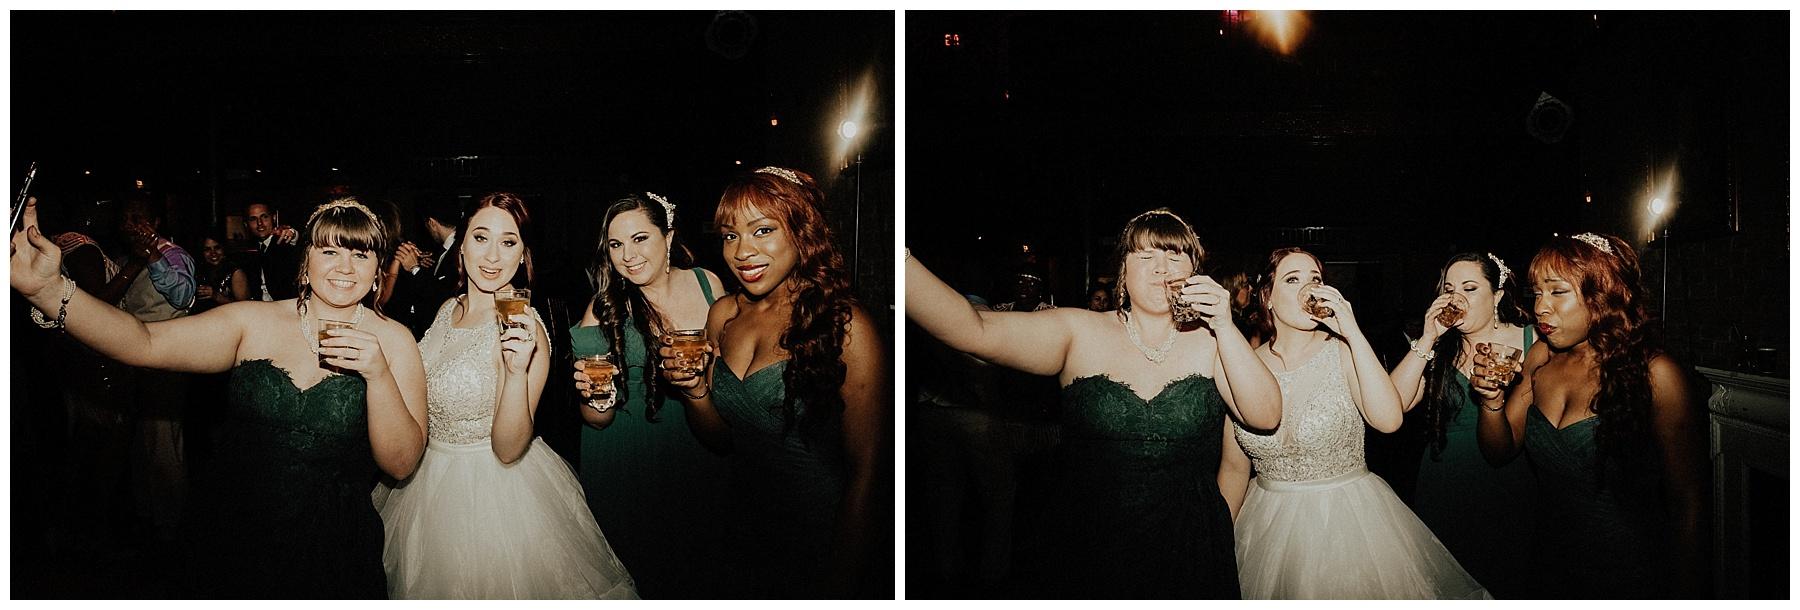 Fort Lauderdale Wedding Tampa Wedding Photographer-163.jpg